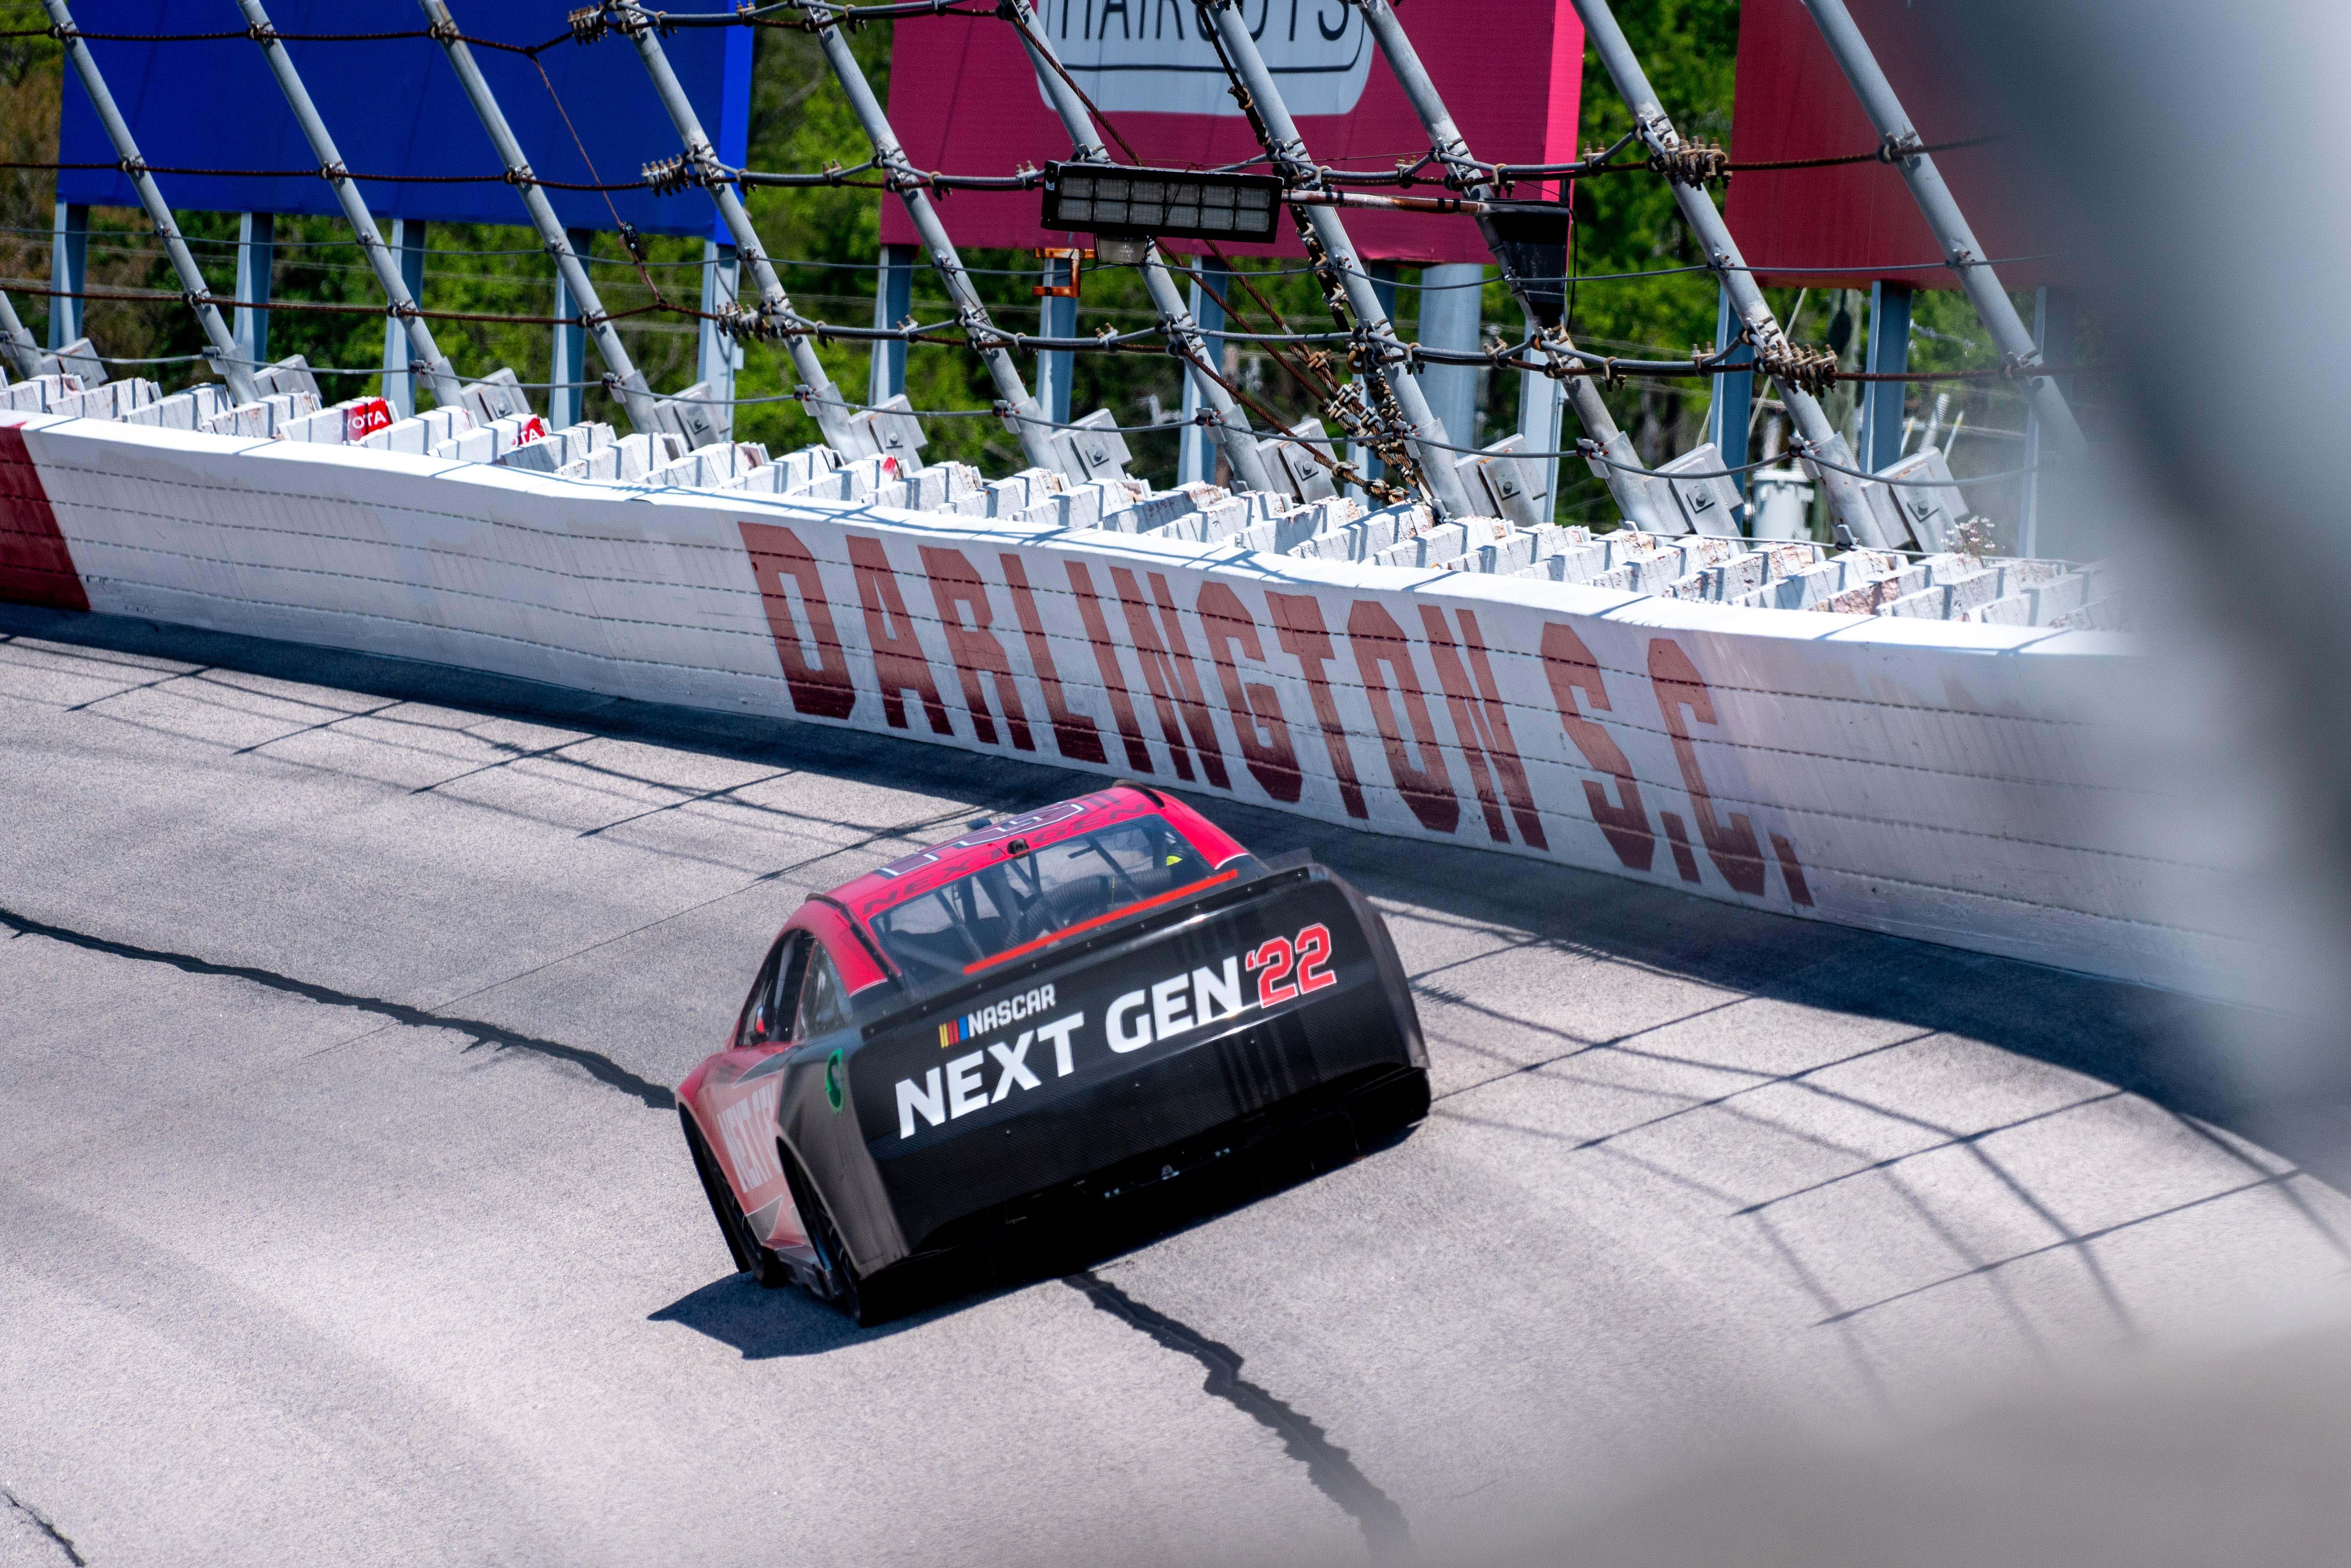 NASCAR Next Gen - Darlington Raceway